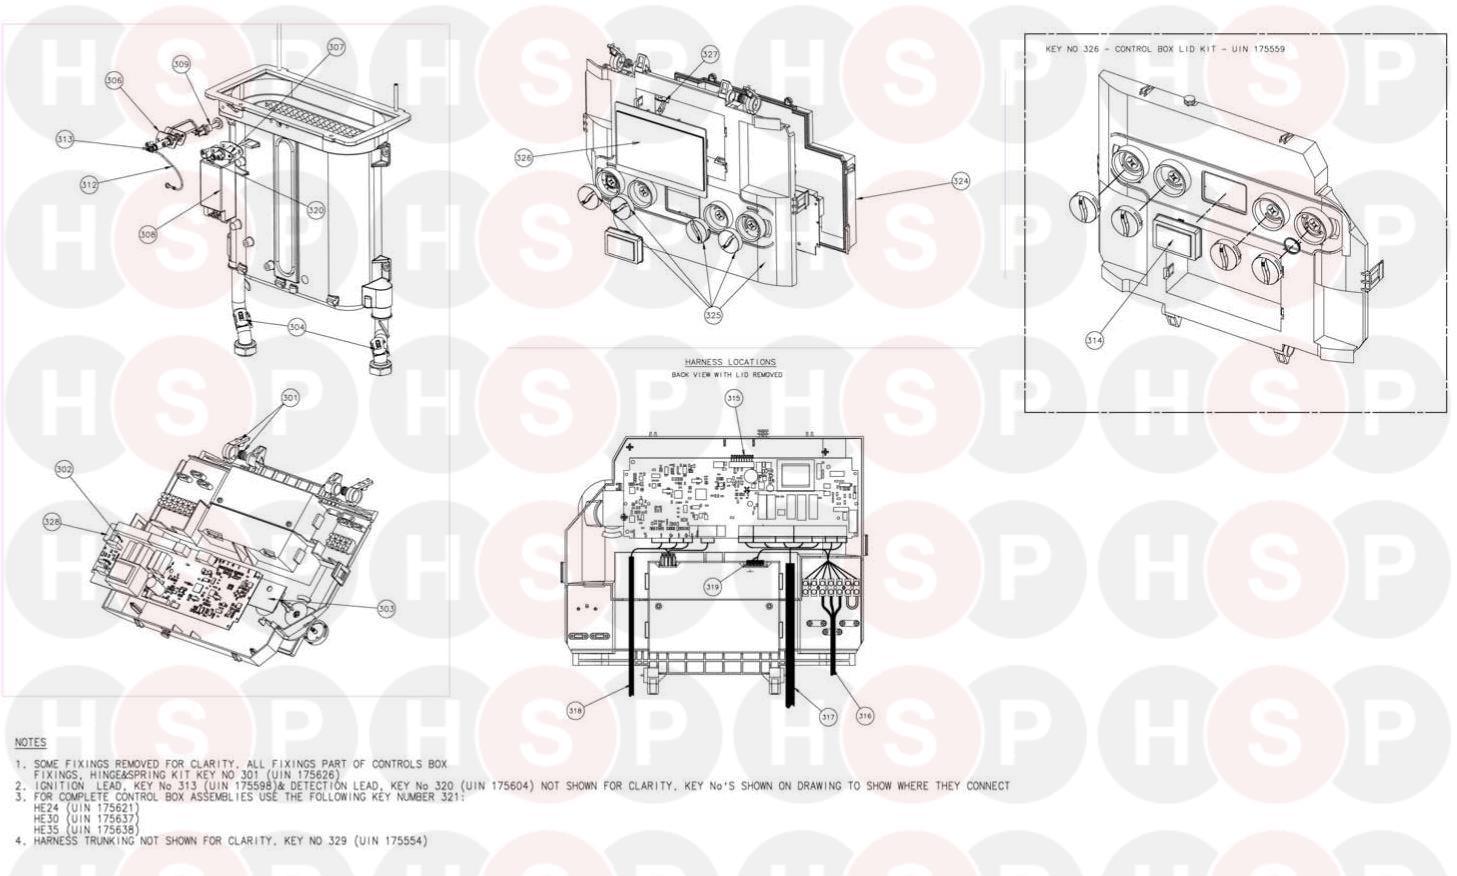 ideal combi e 30 controls diagram heating spare parts. Black Bedroom Furniture Sets. Home Design Ideas